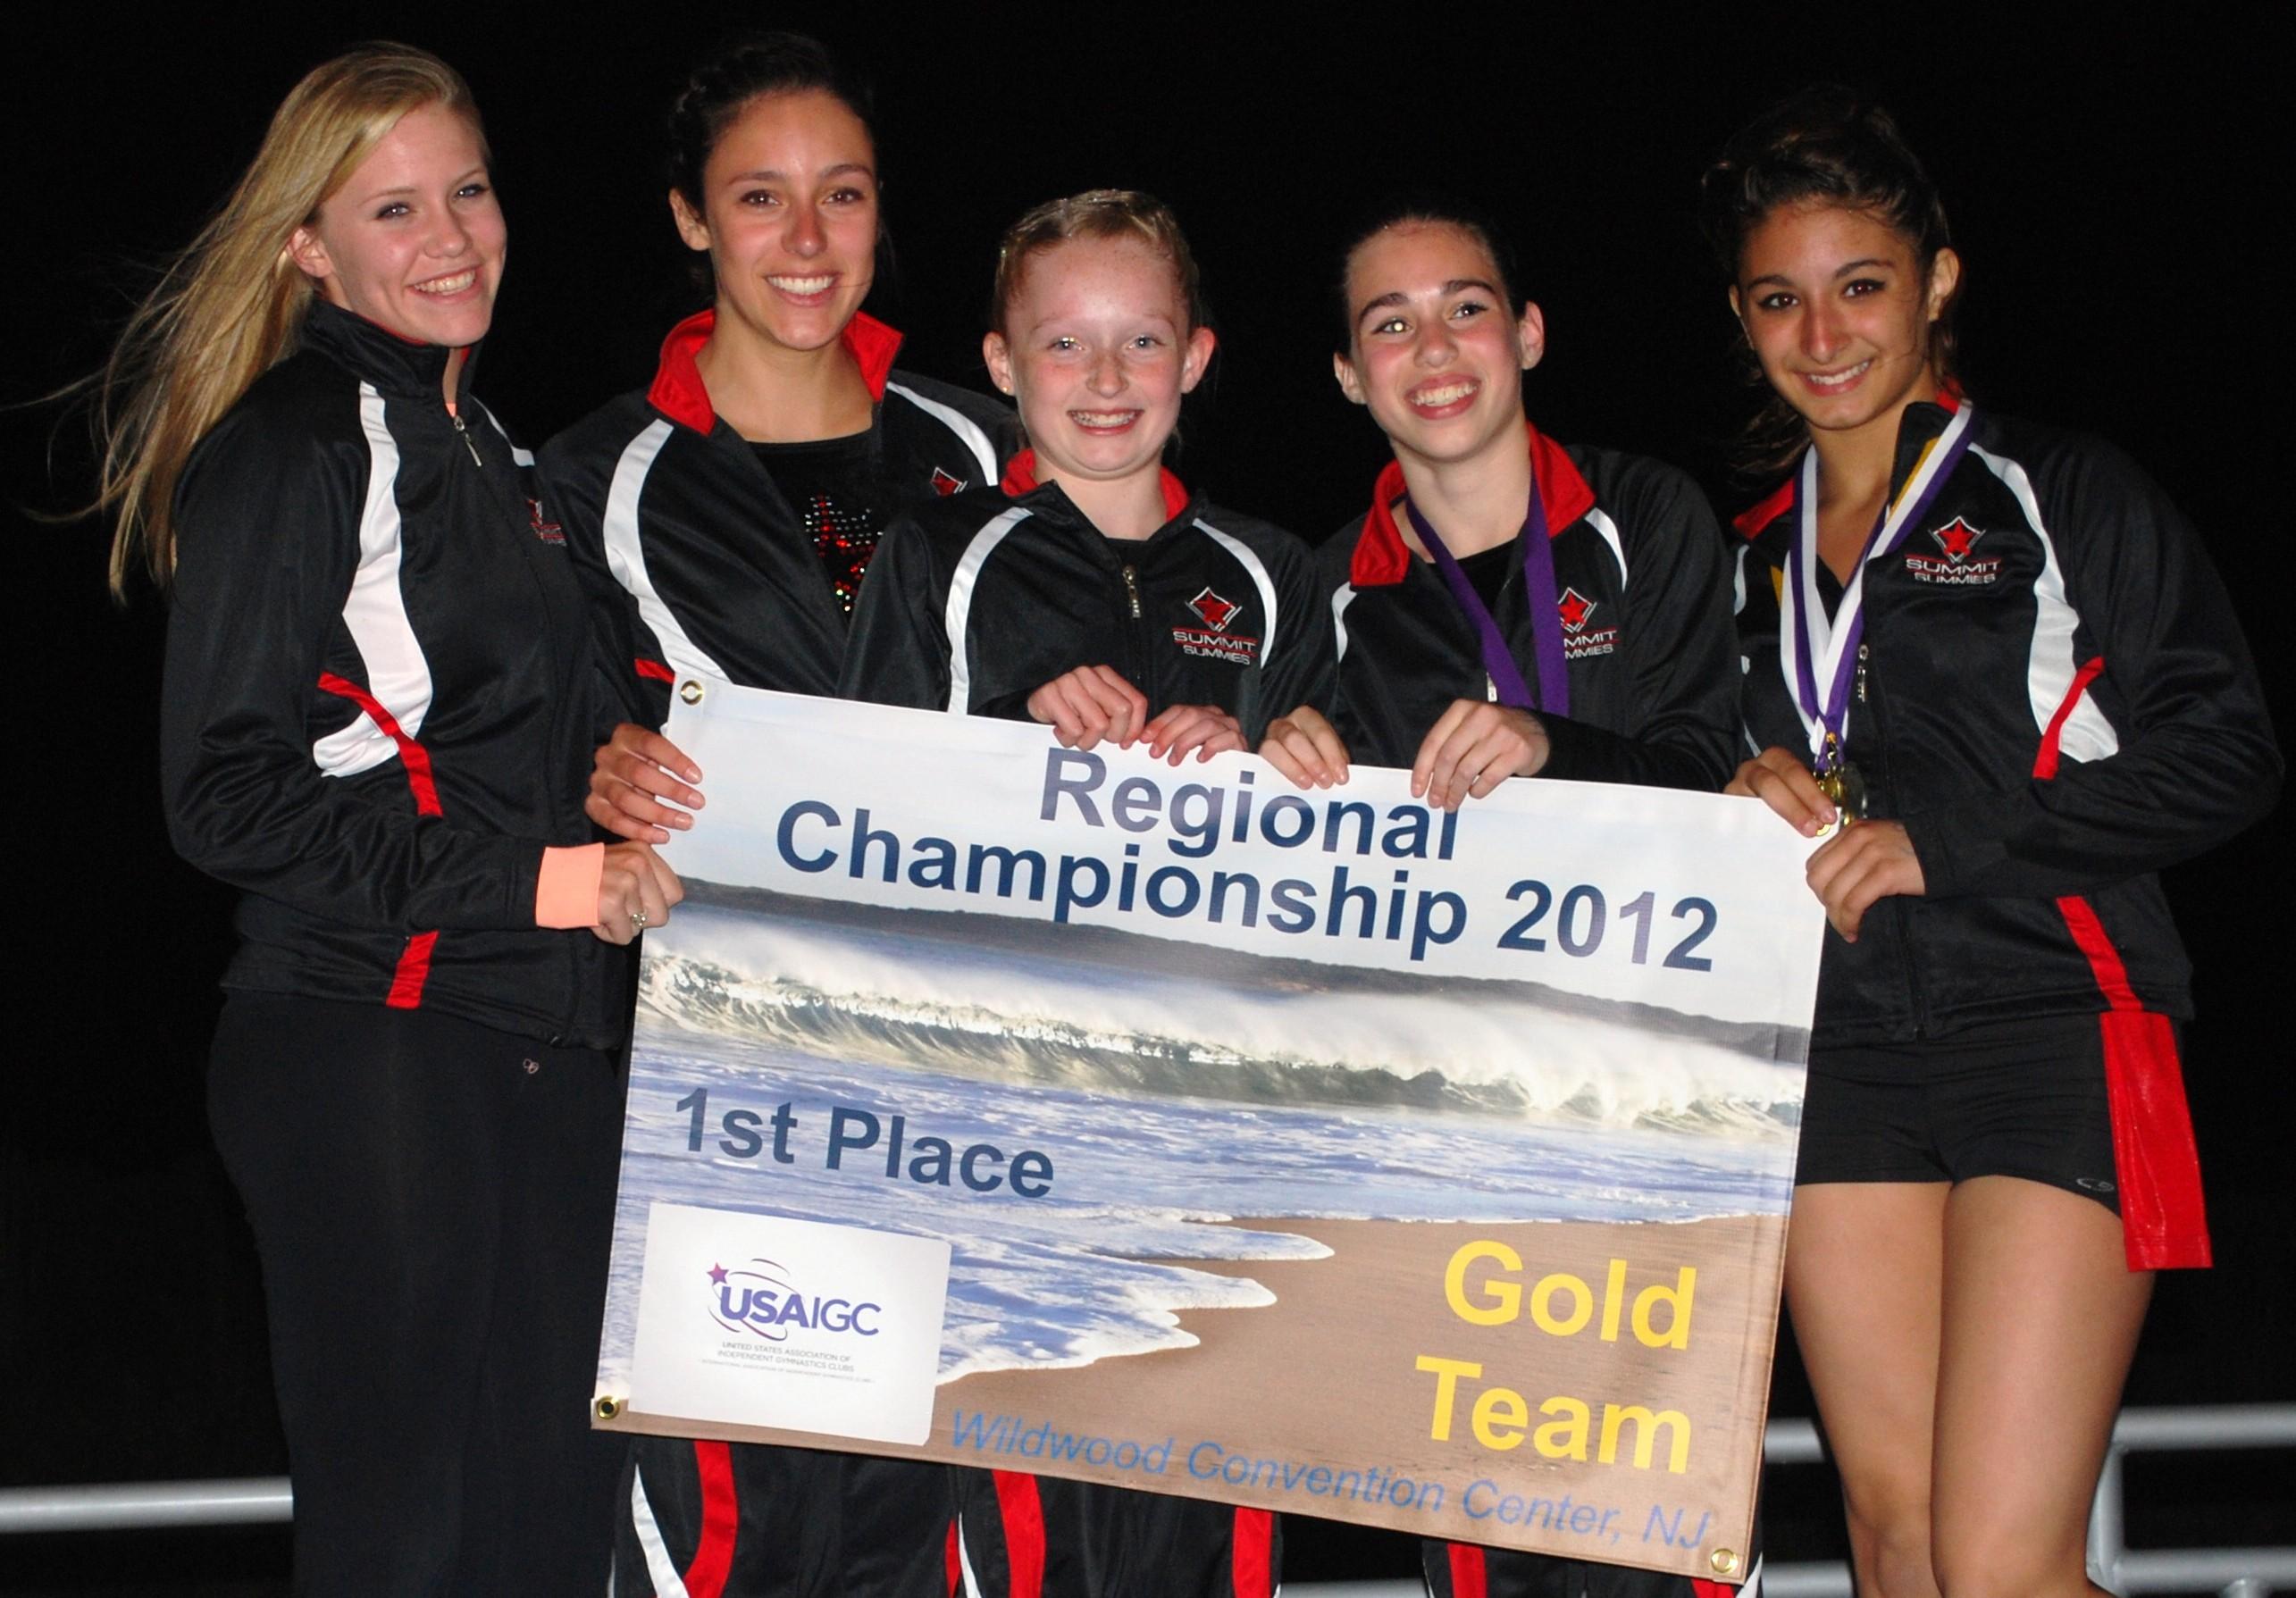 603edc3f0306bea475cf_gold_team_regional_champs.jpg